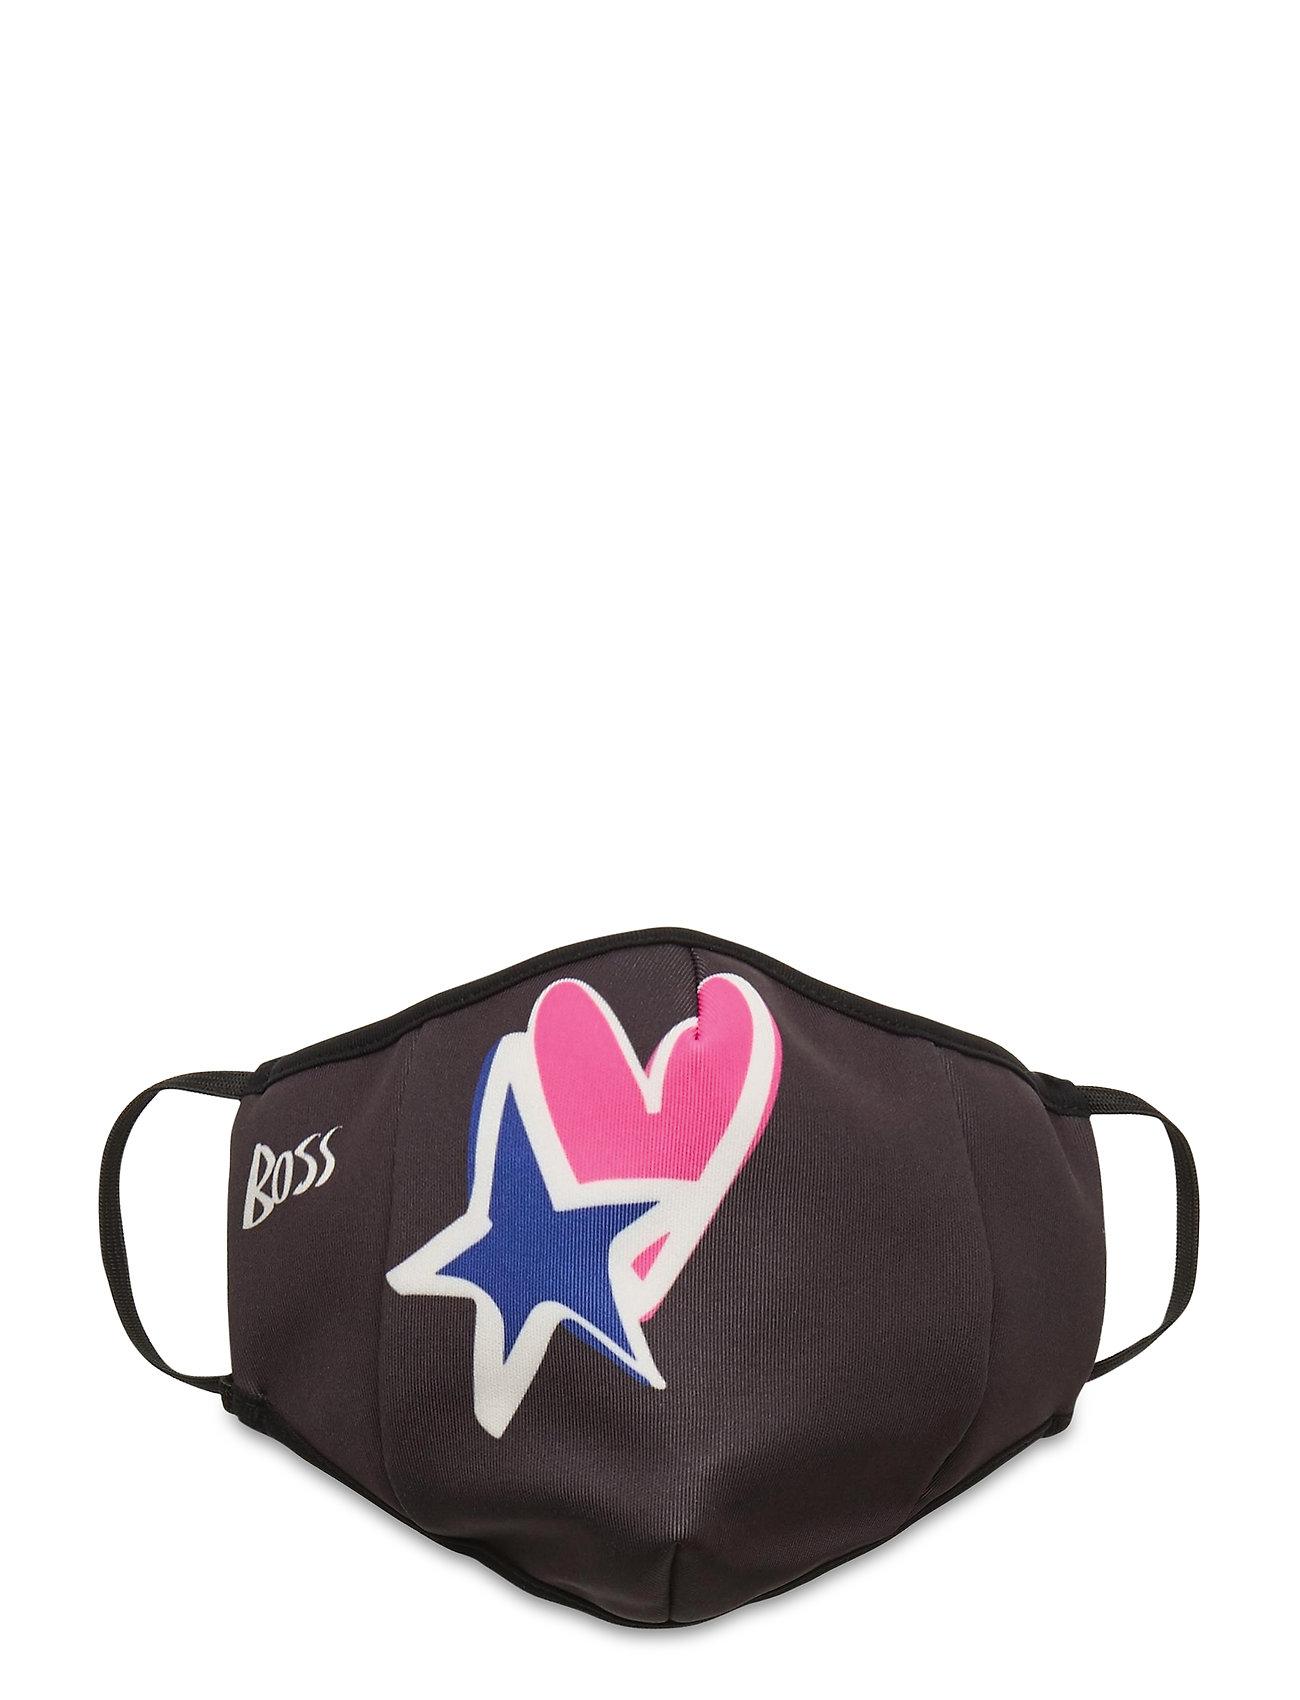 Image of Boss Mask Jt Accessories Face Masks Sort BOSS (3484278131)